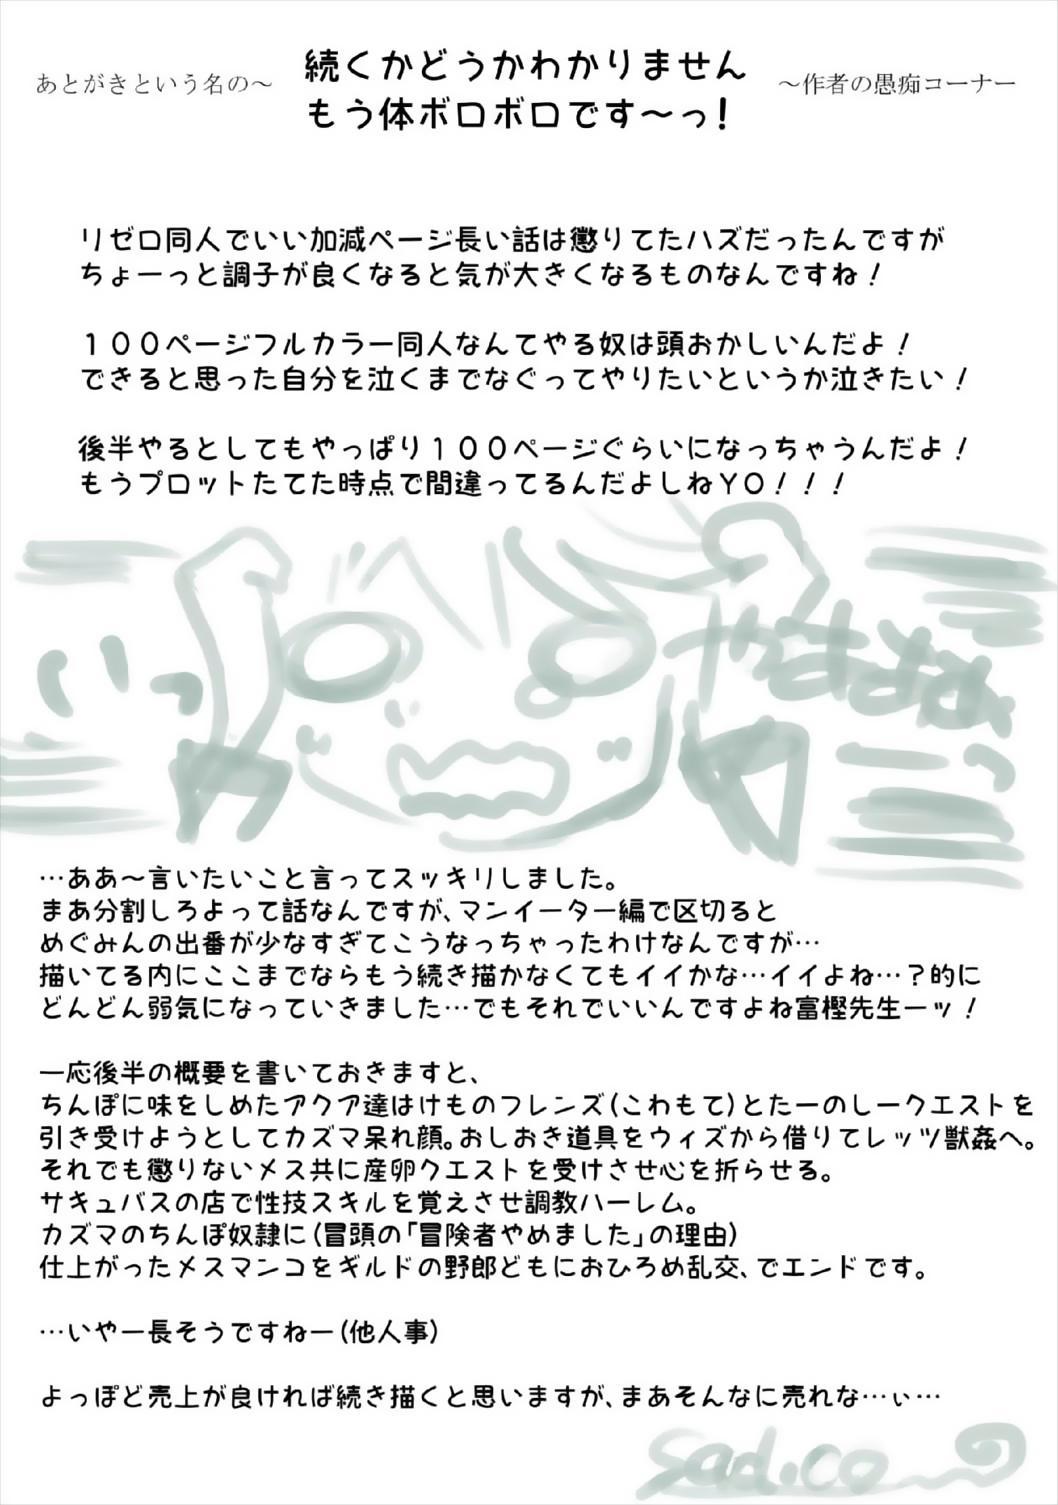 Kono Subarashii Mamono-tachi de Nikubenki 89